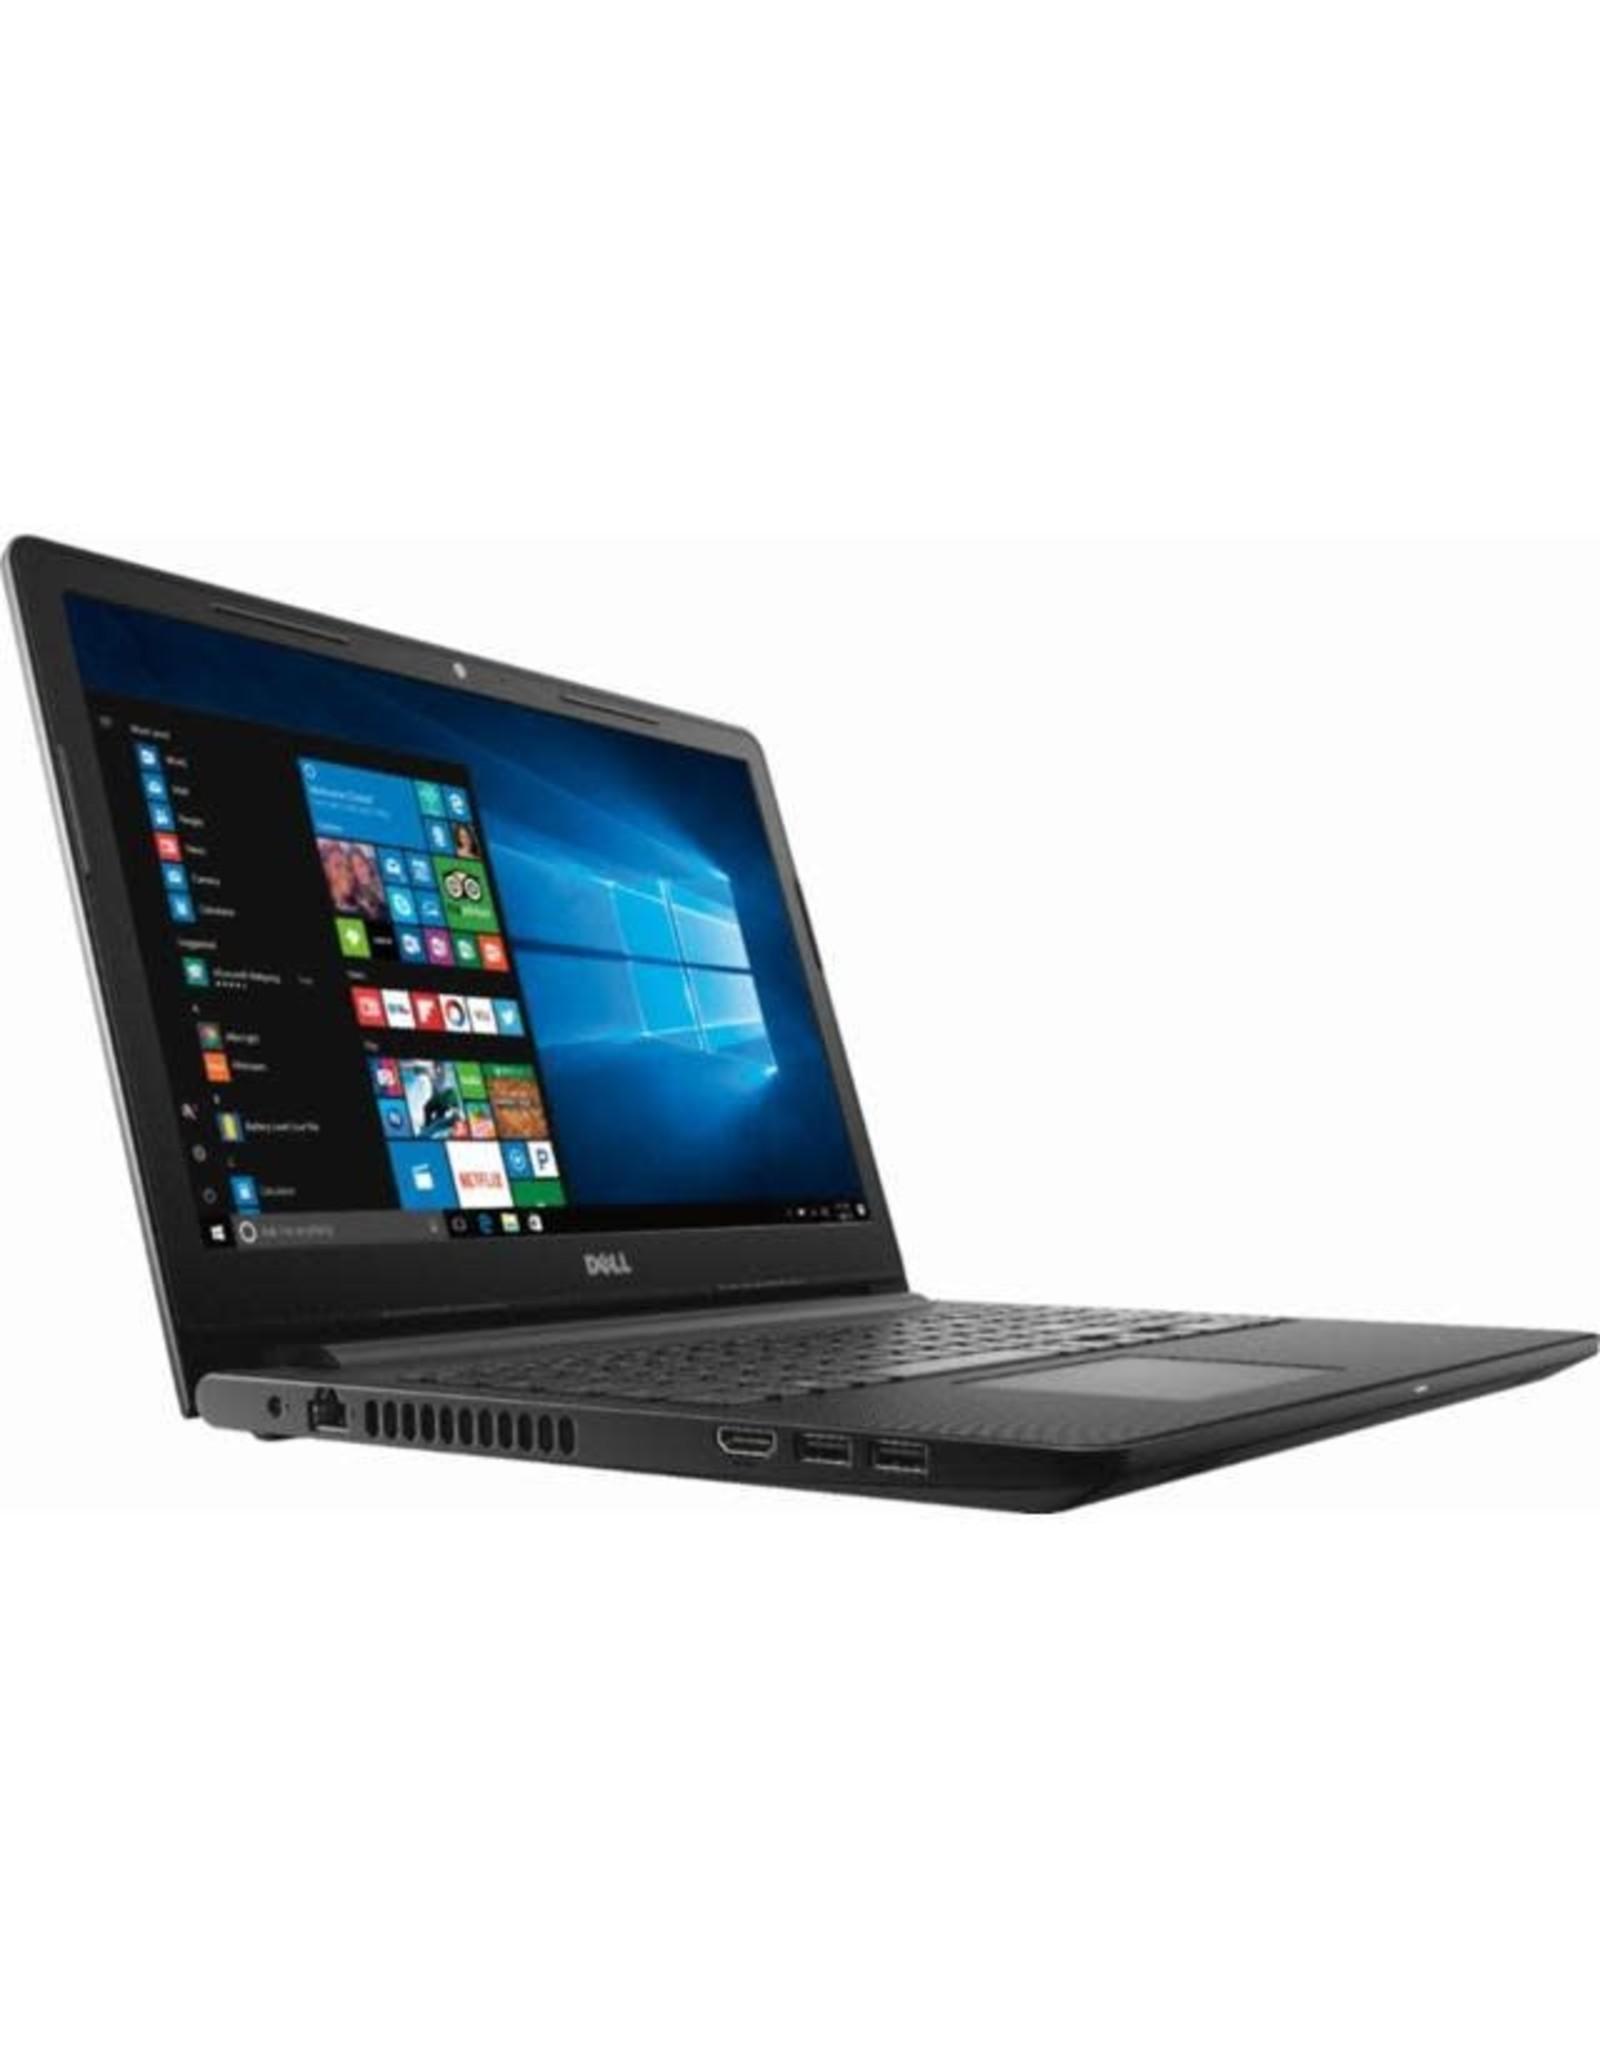 "Dell Laptop 15.6"" Inspiron i3573-P269BLK-PUS"